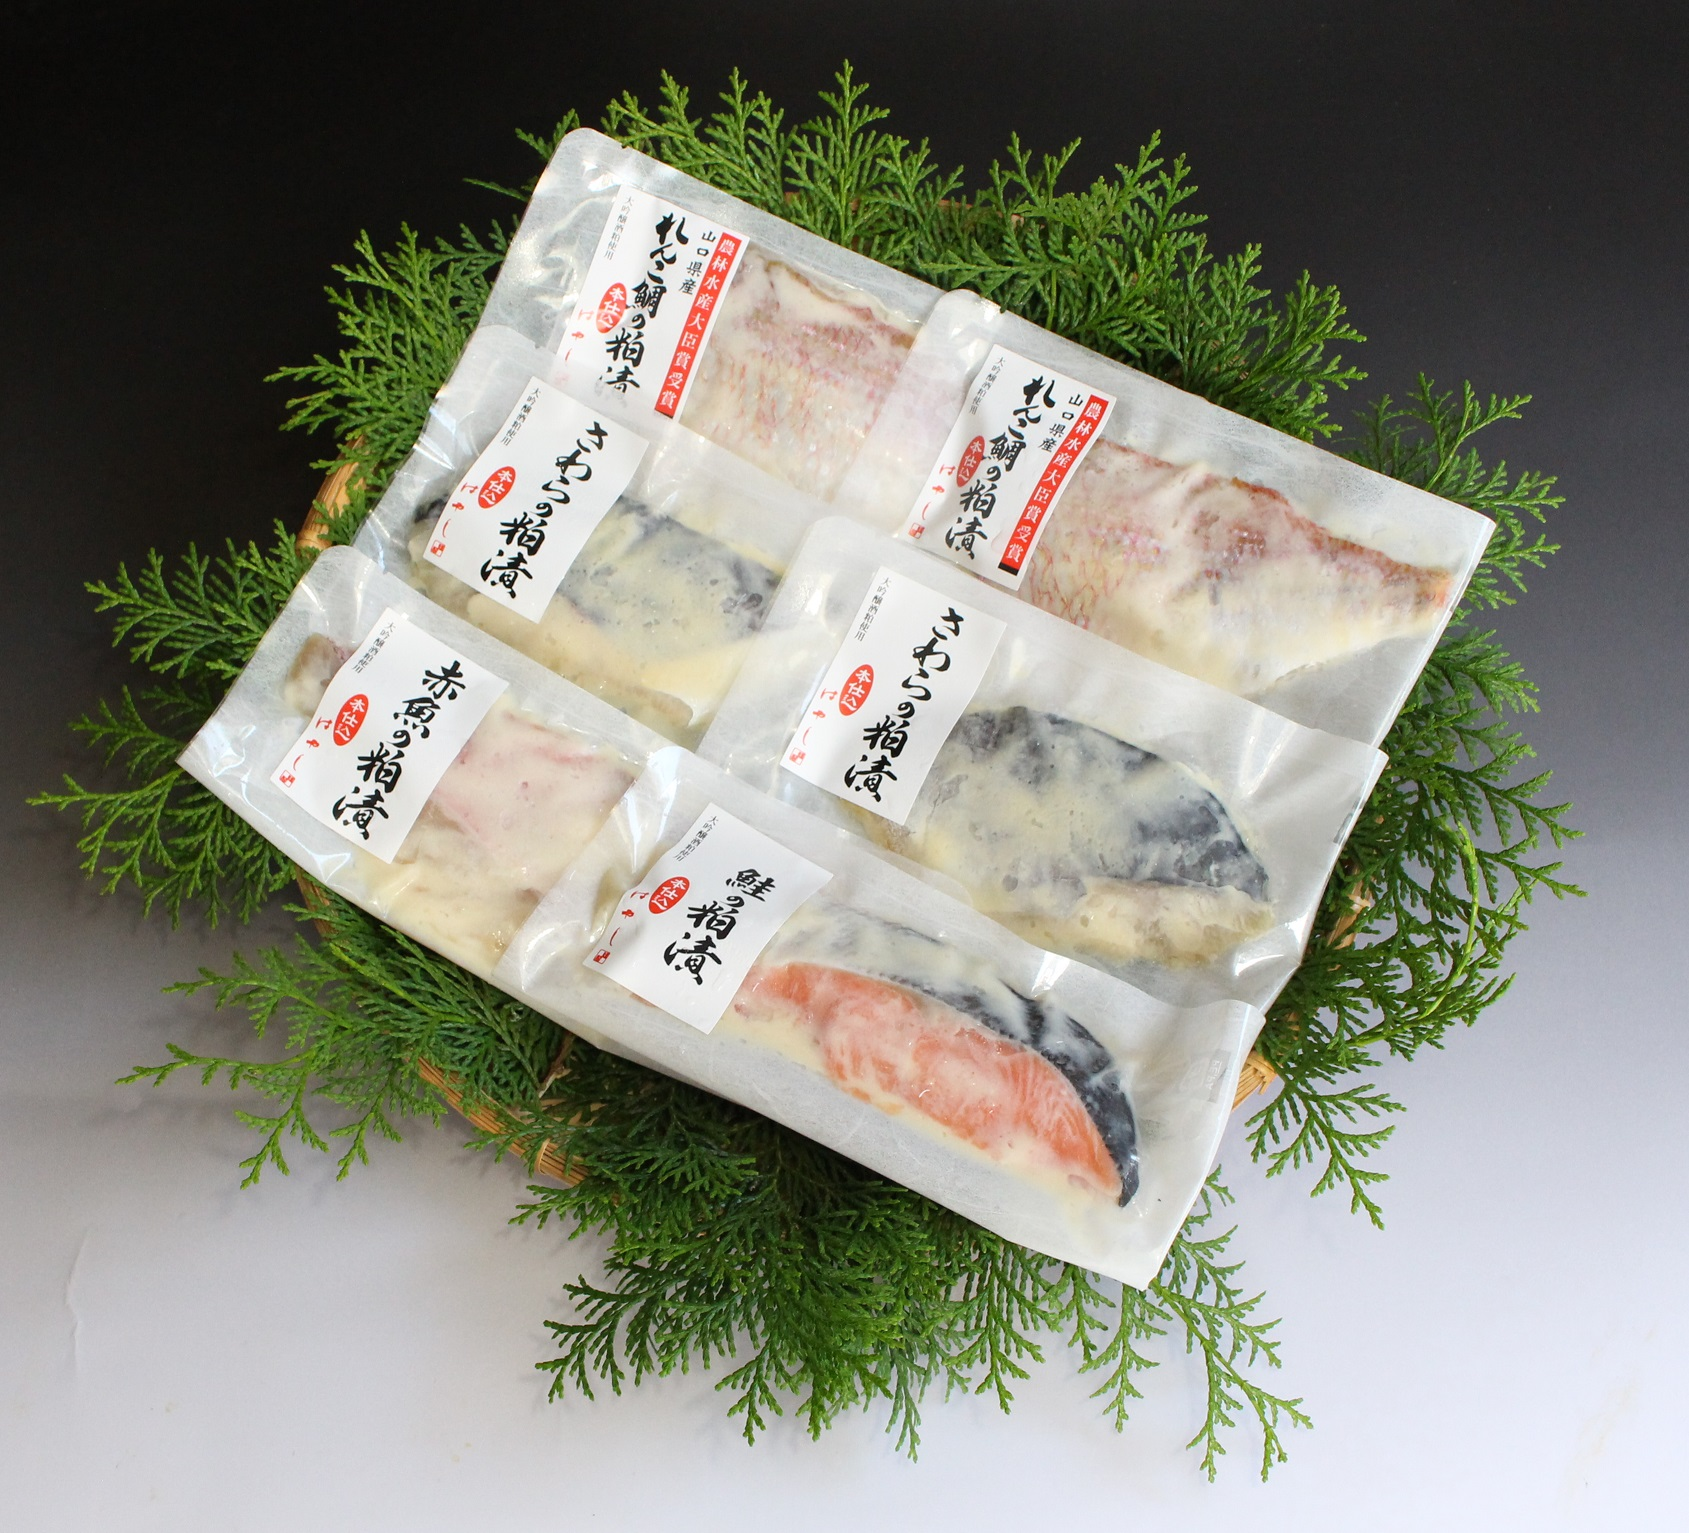 ★Y382 純米大吟醸の粕漬切身6切セット(華)